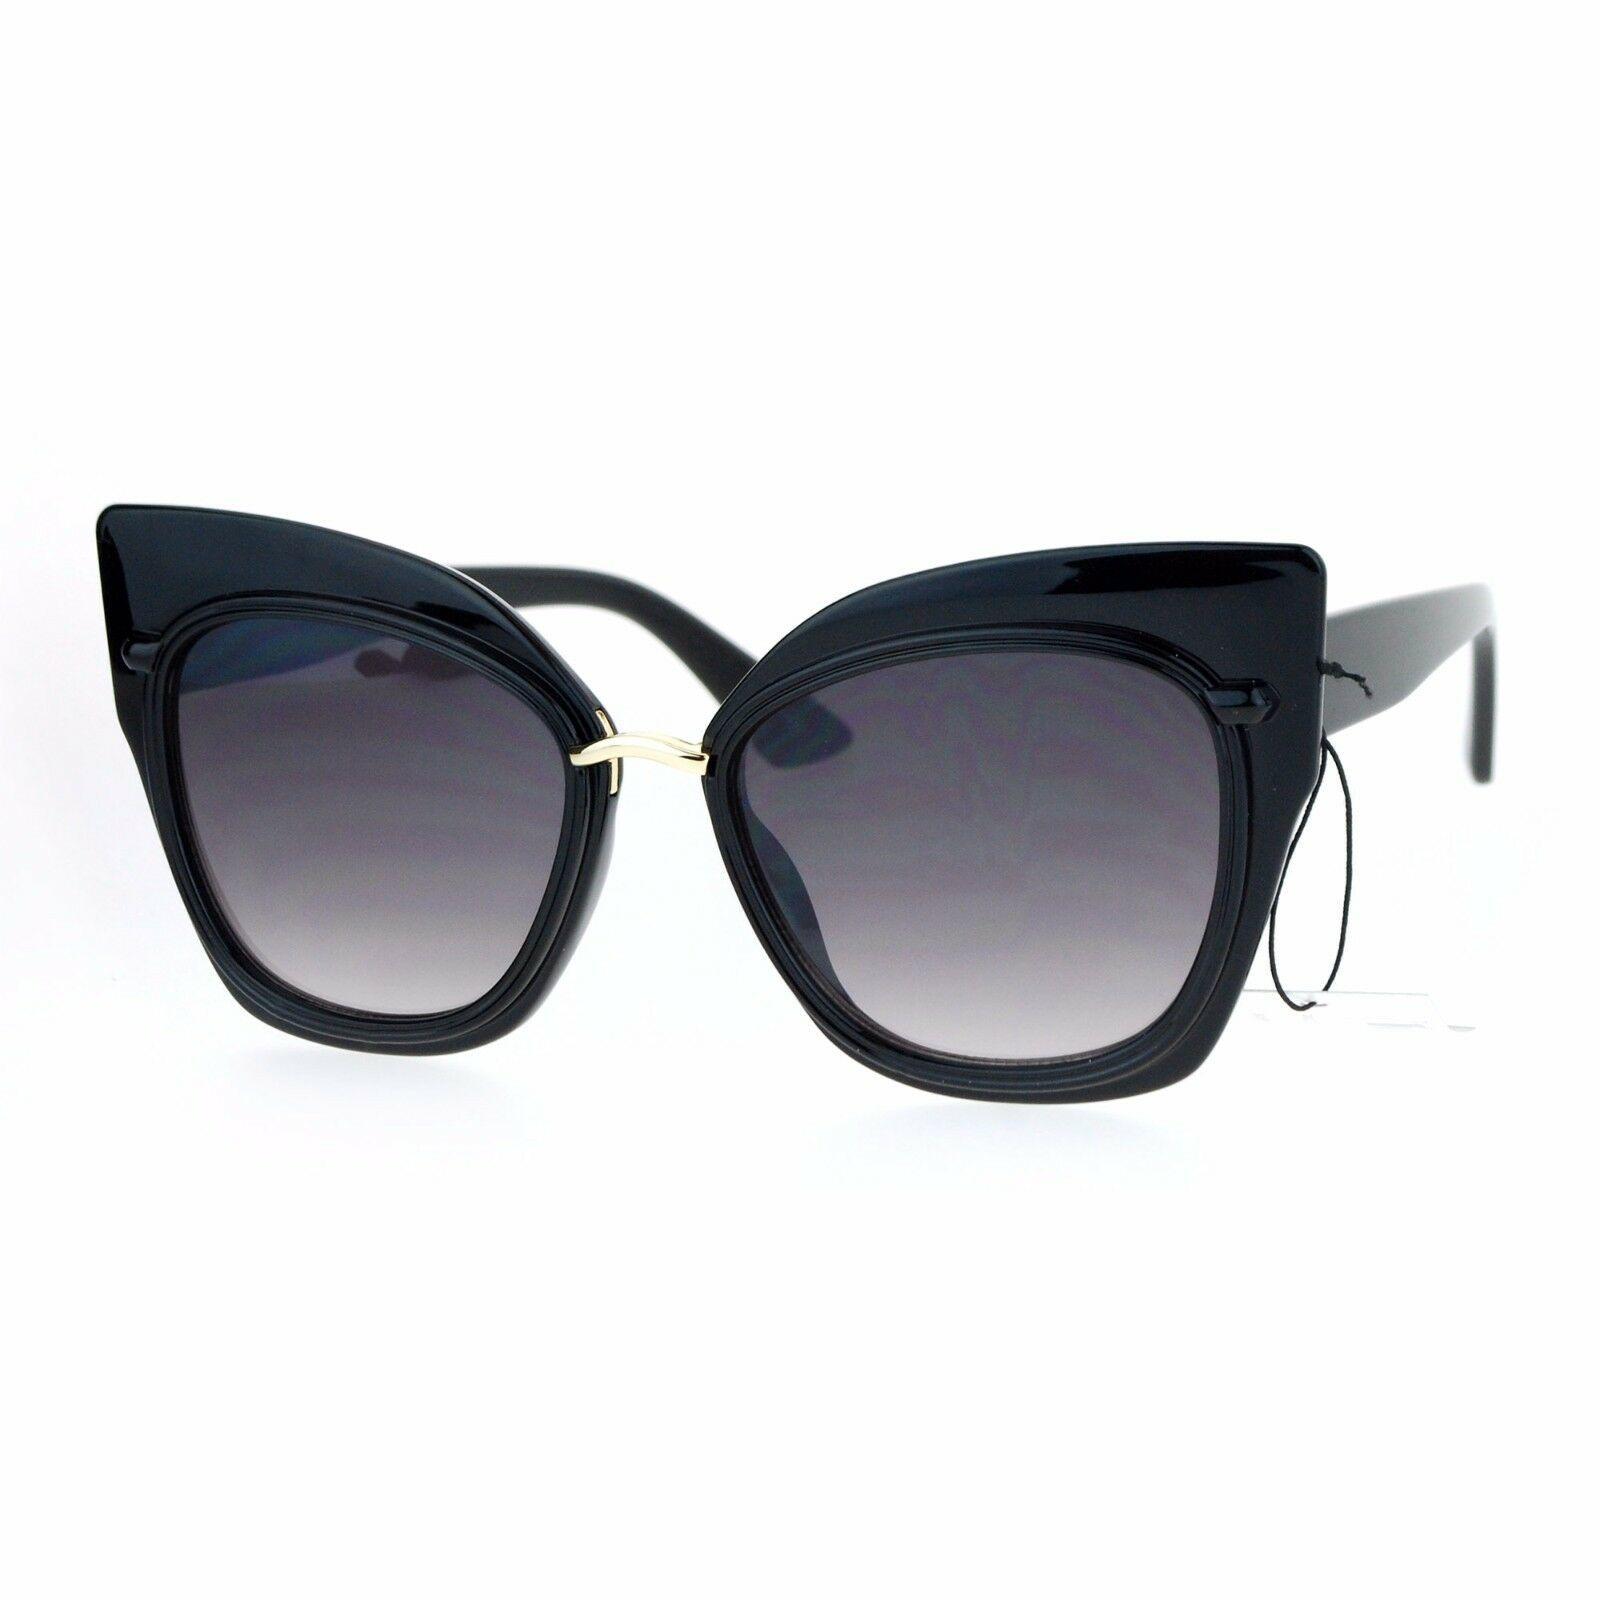 Oversized Fashion Sunglasses Womens Square Cateye Butterfly UV 400 image 5